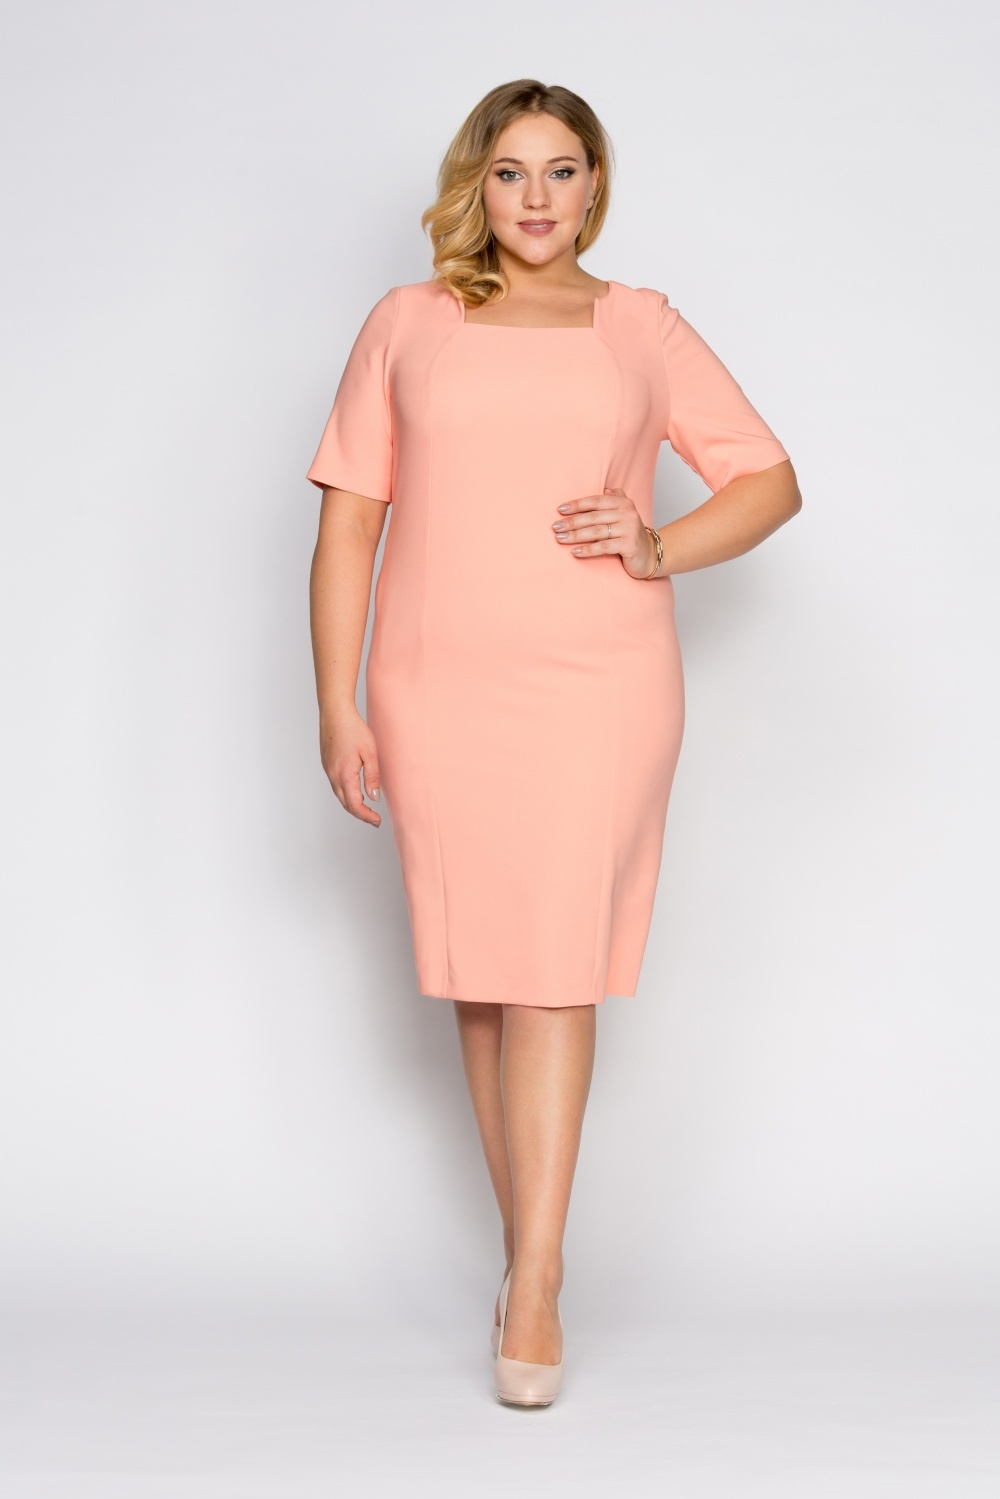 Платья Платье Коралл 2fb50783e50f6a6ac0e813b8170d2691.jpg